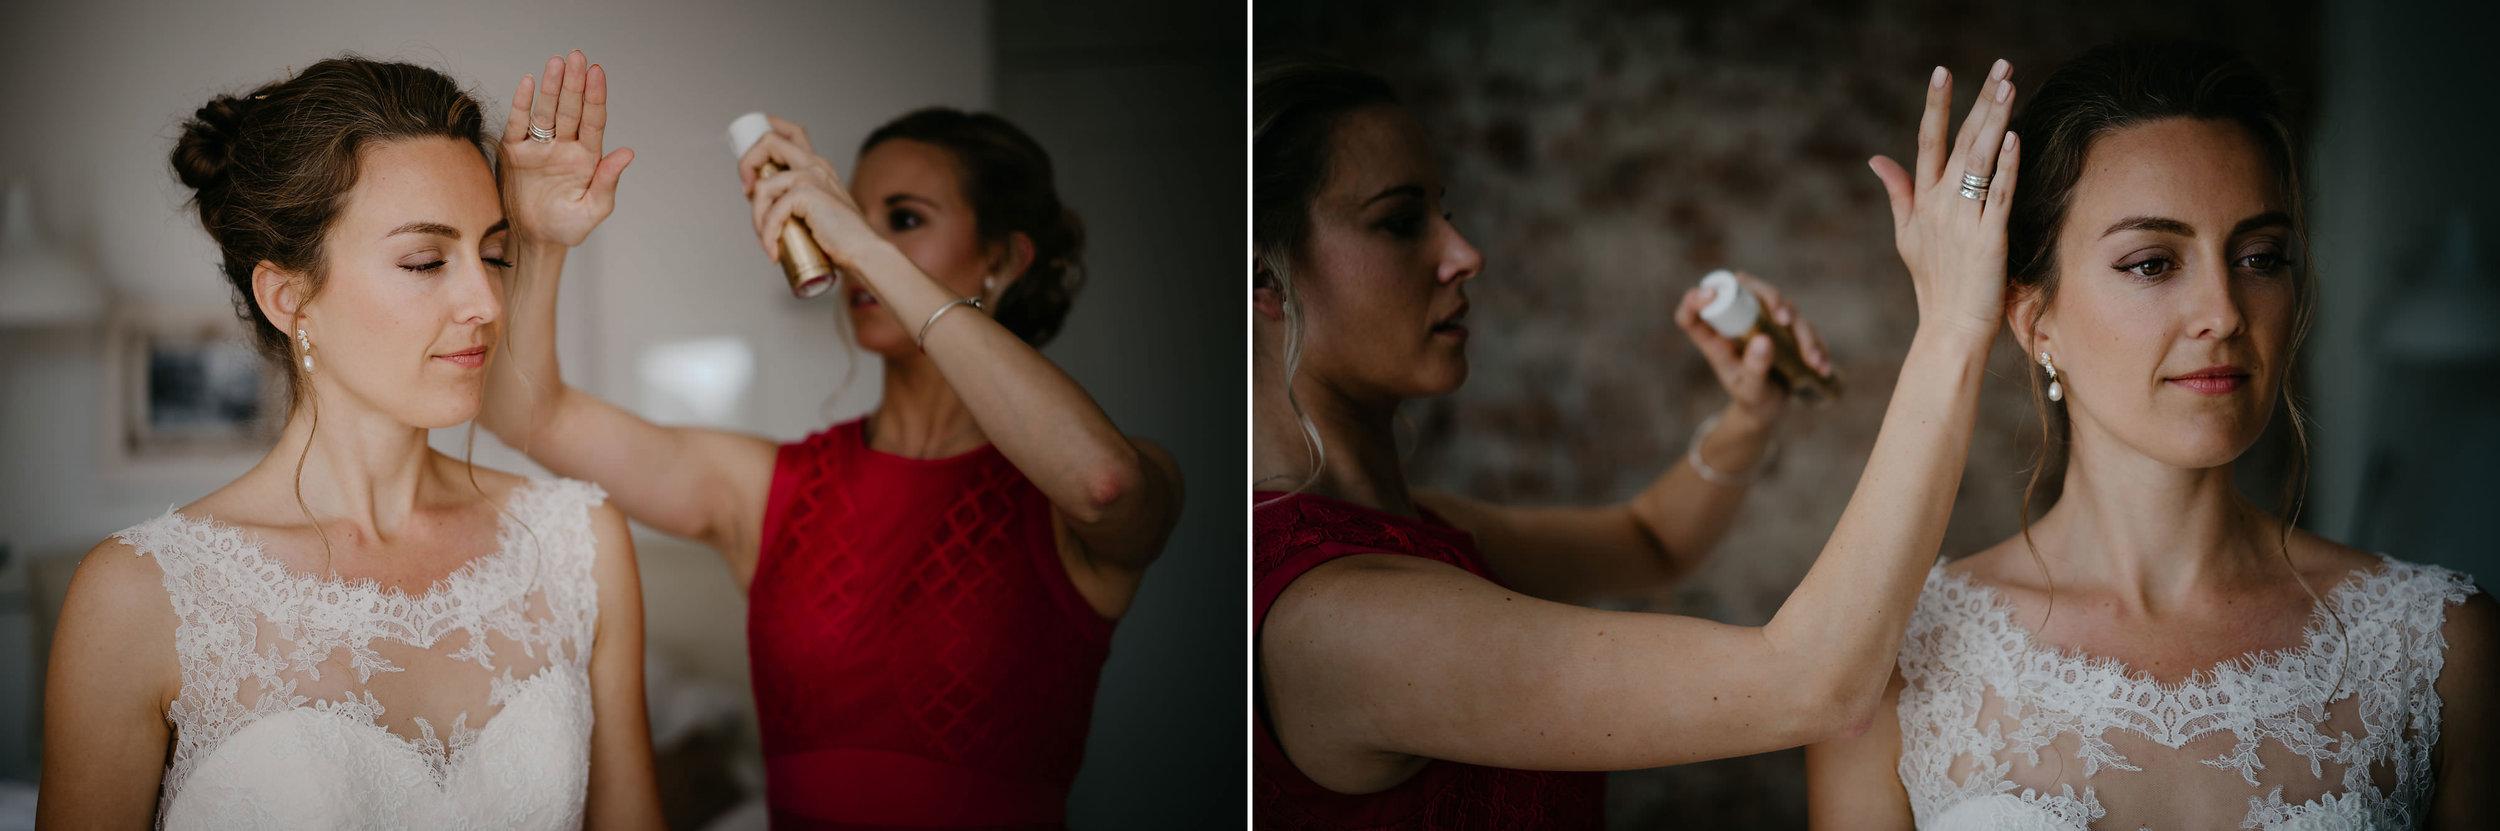 bride wedding hair and make-up photographer mark hadden